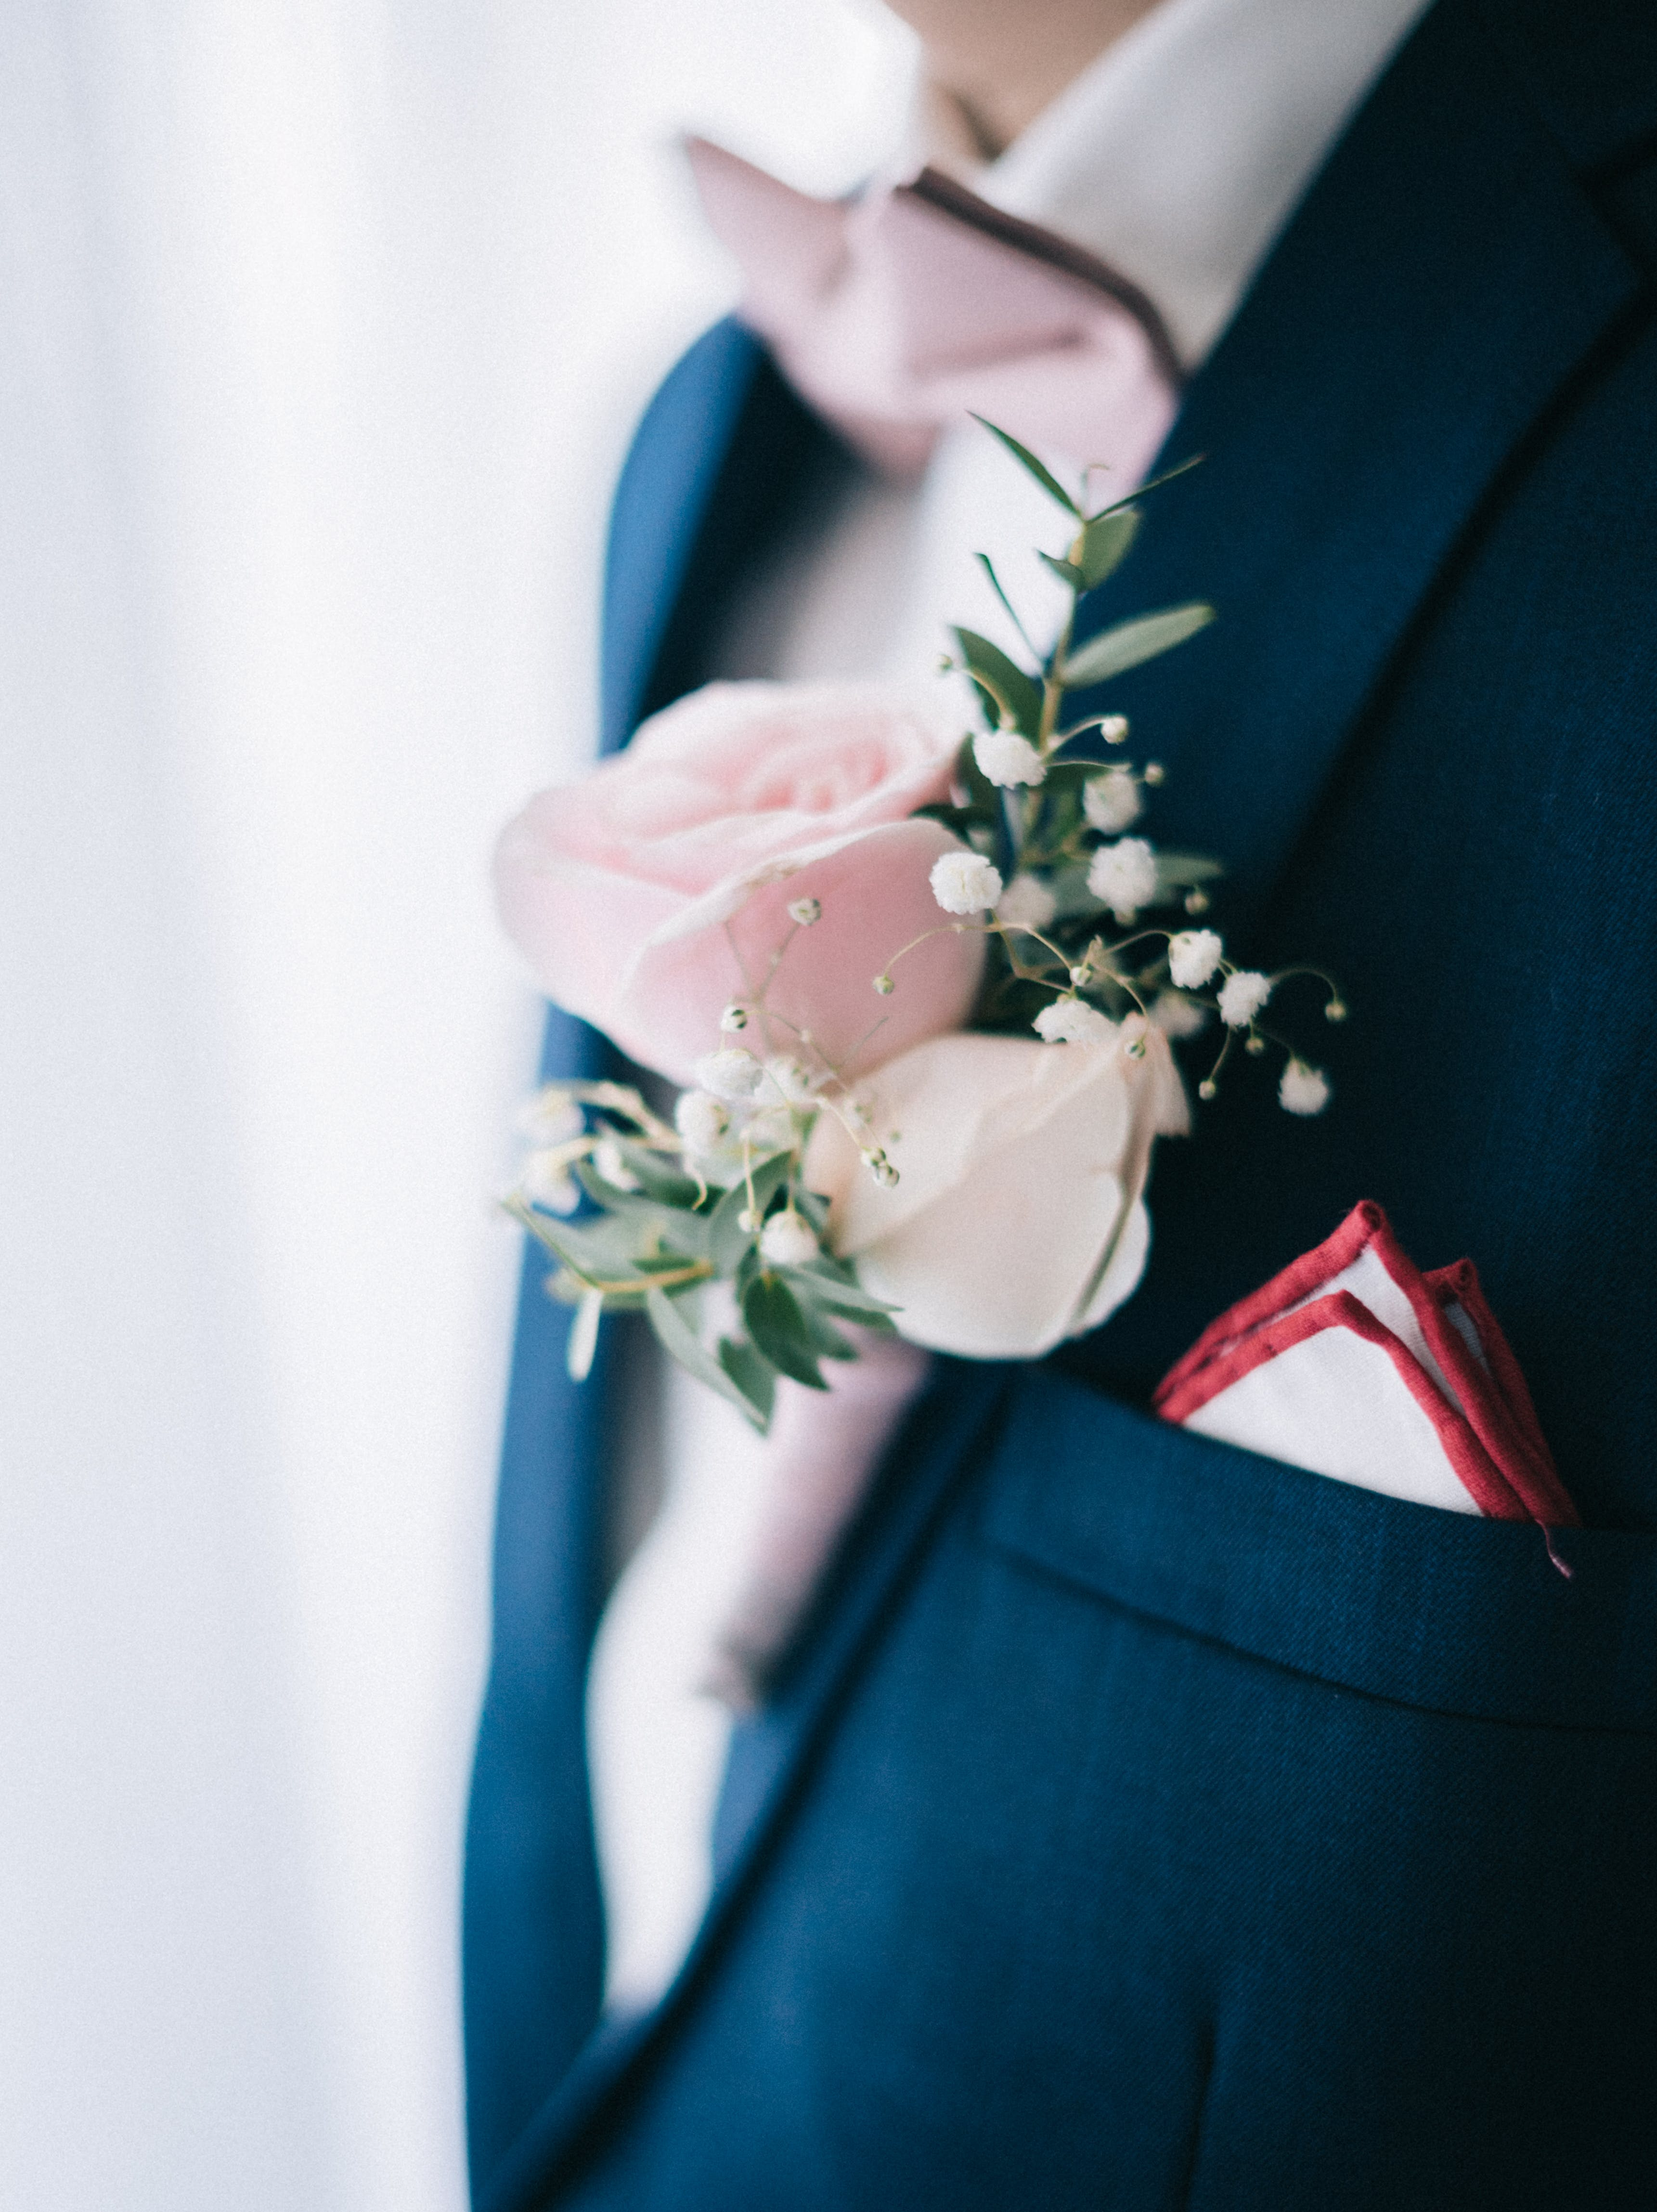 Gratis stockfoto met bloem, bruidegom, ceremonie, charmant